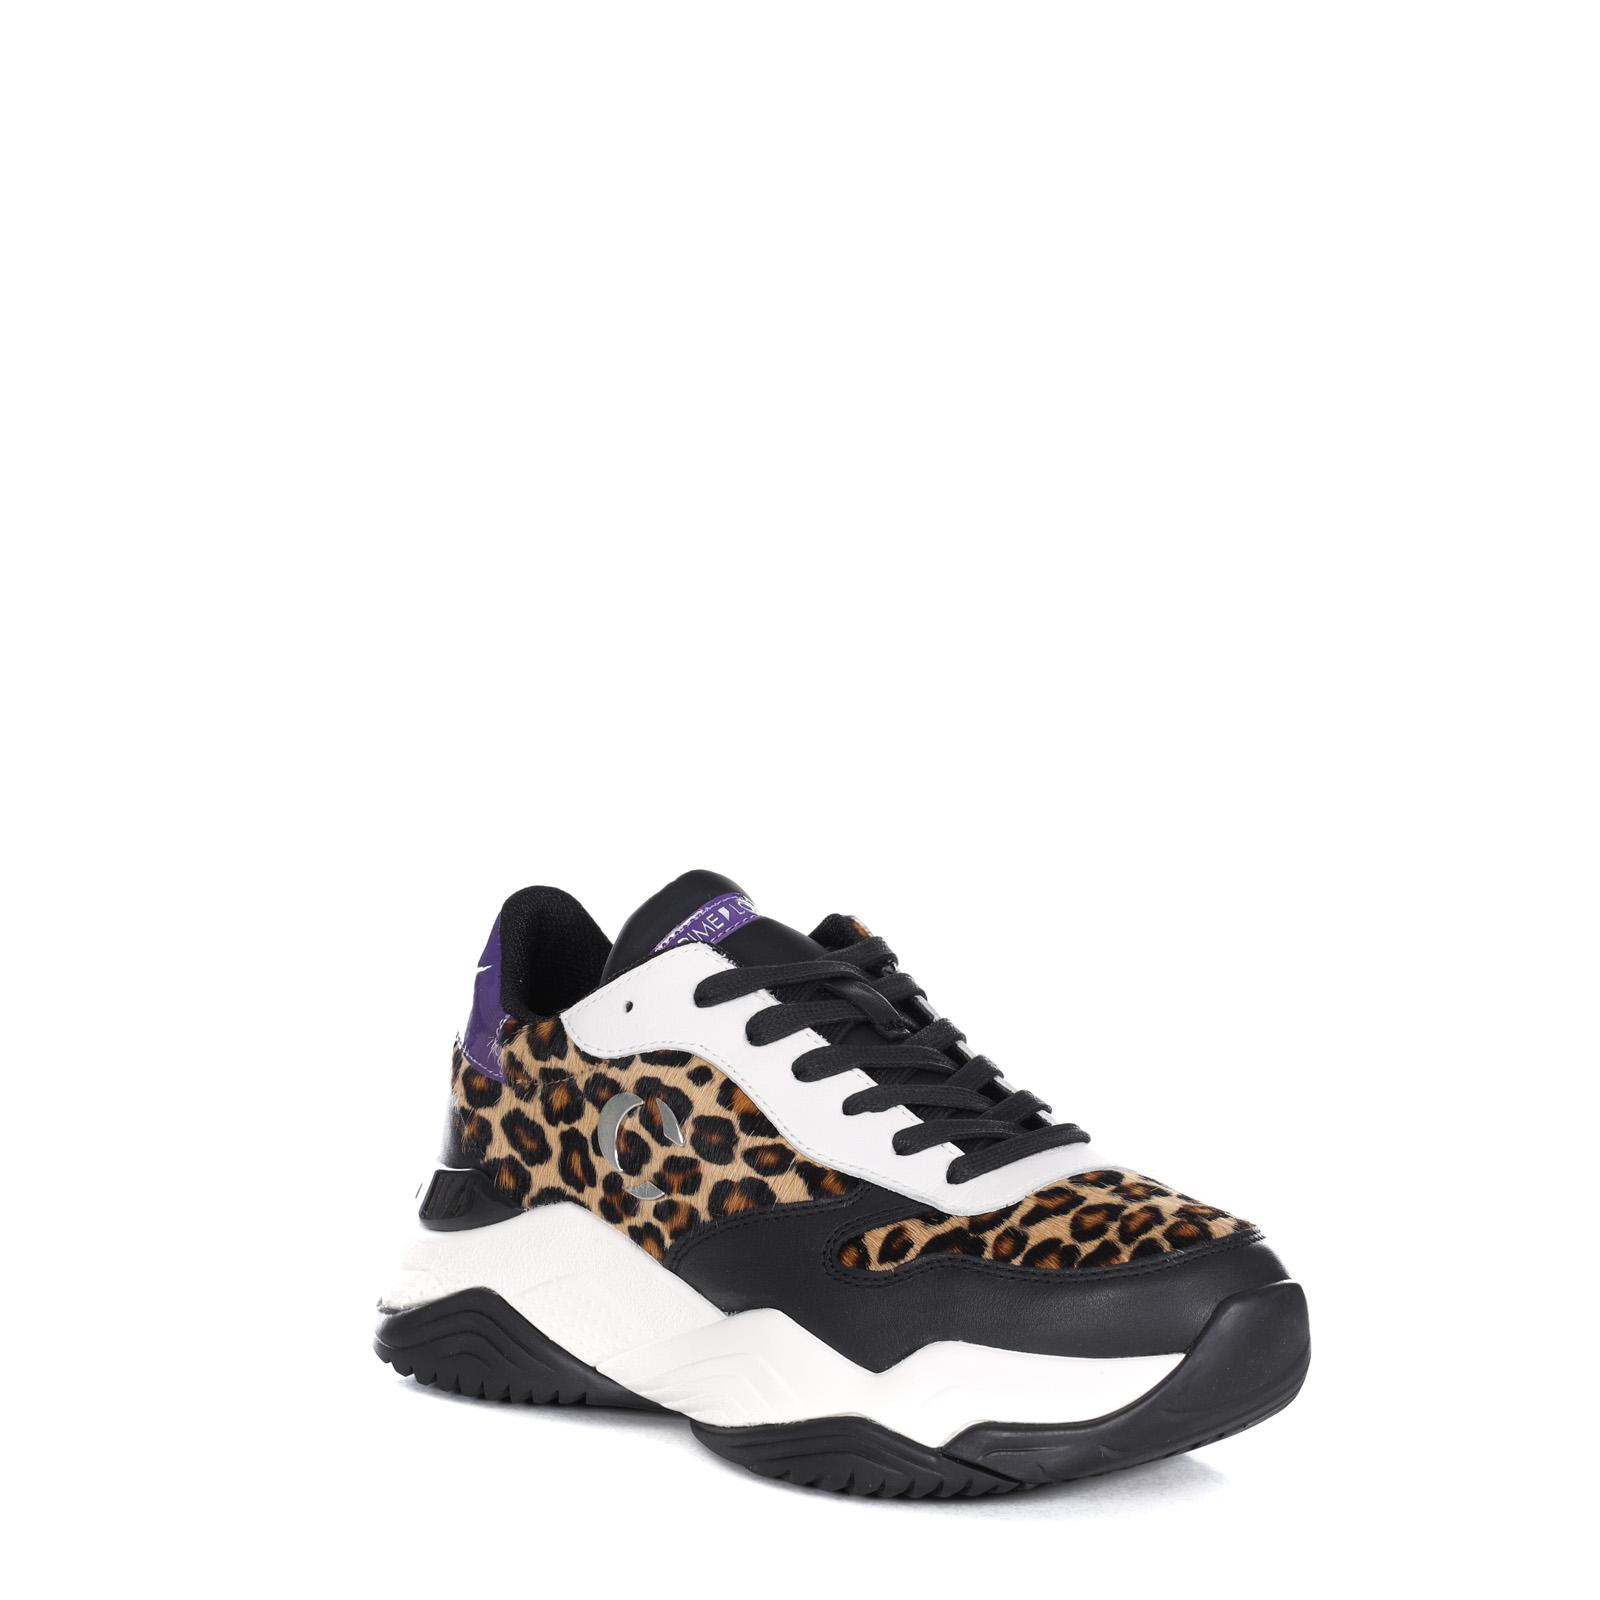 CRIME LONDON | Sneakers | 25300AA2BLACK